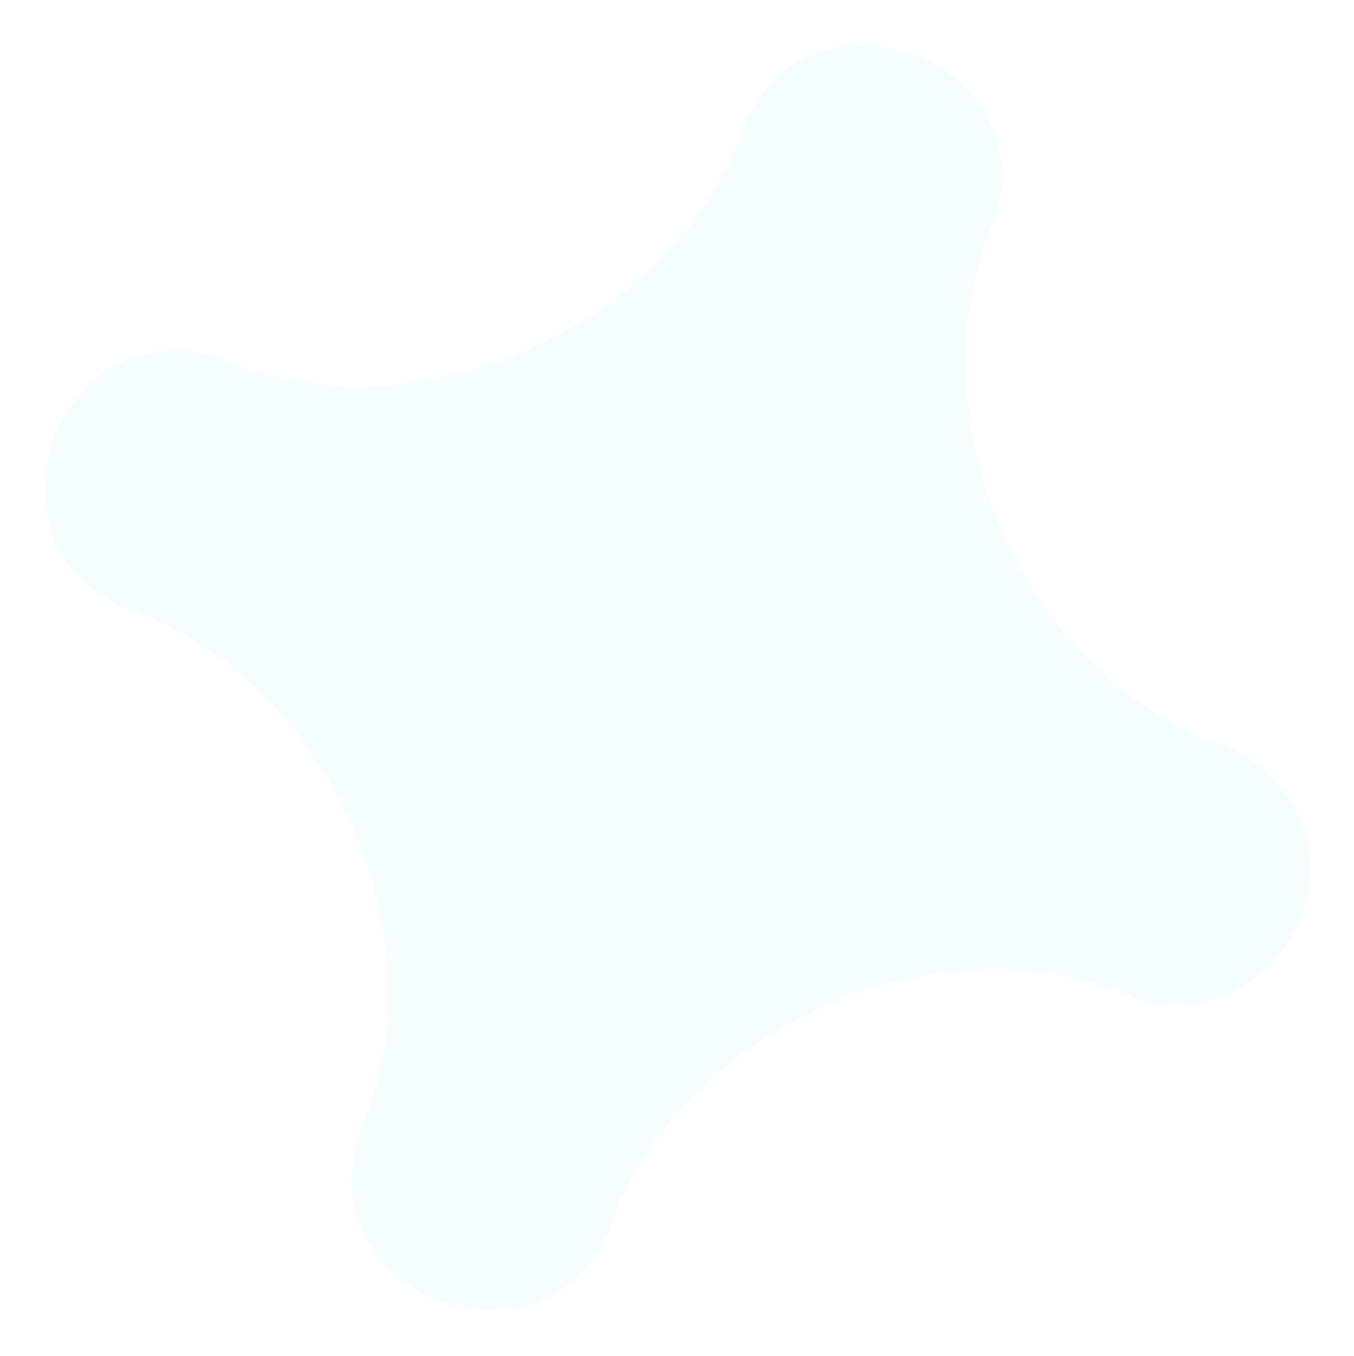 header shape